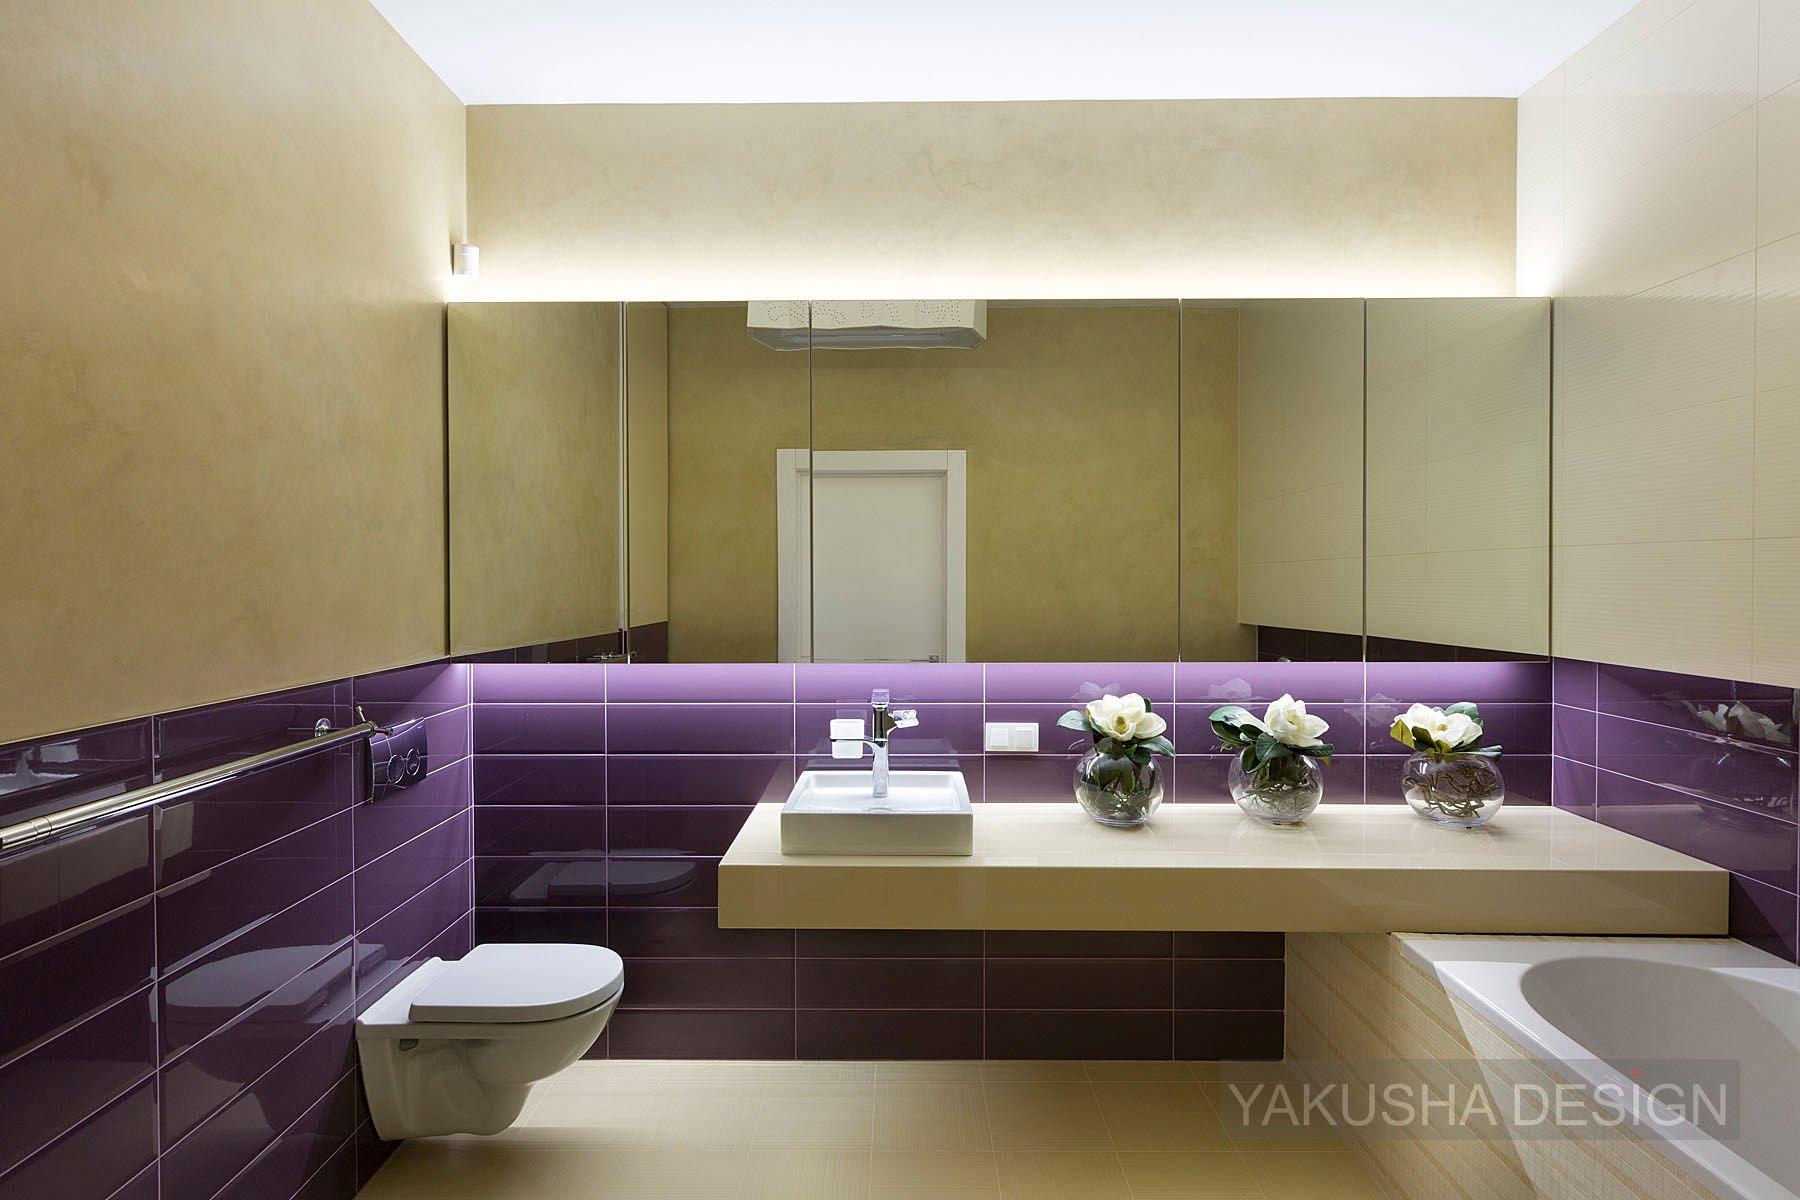 Residential Quarter Fountain Boulevard By Yakusha Design